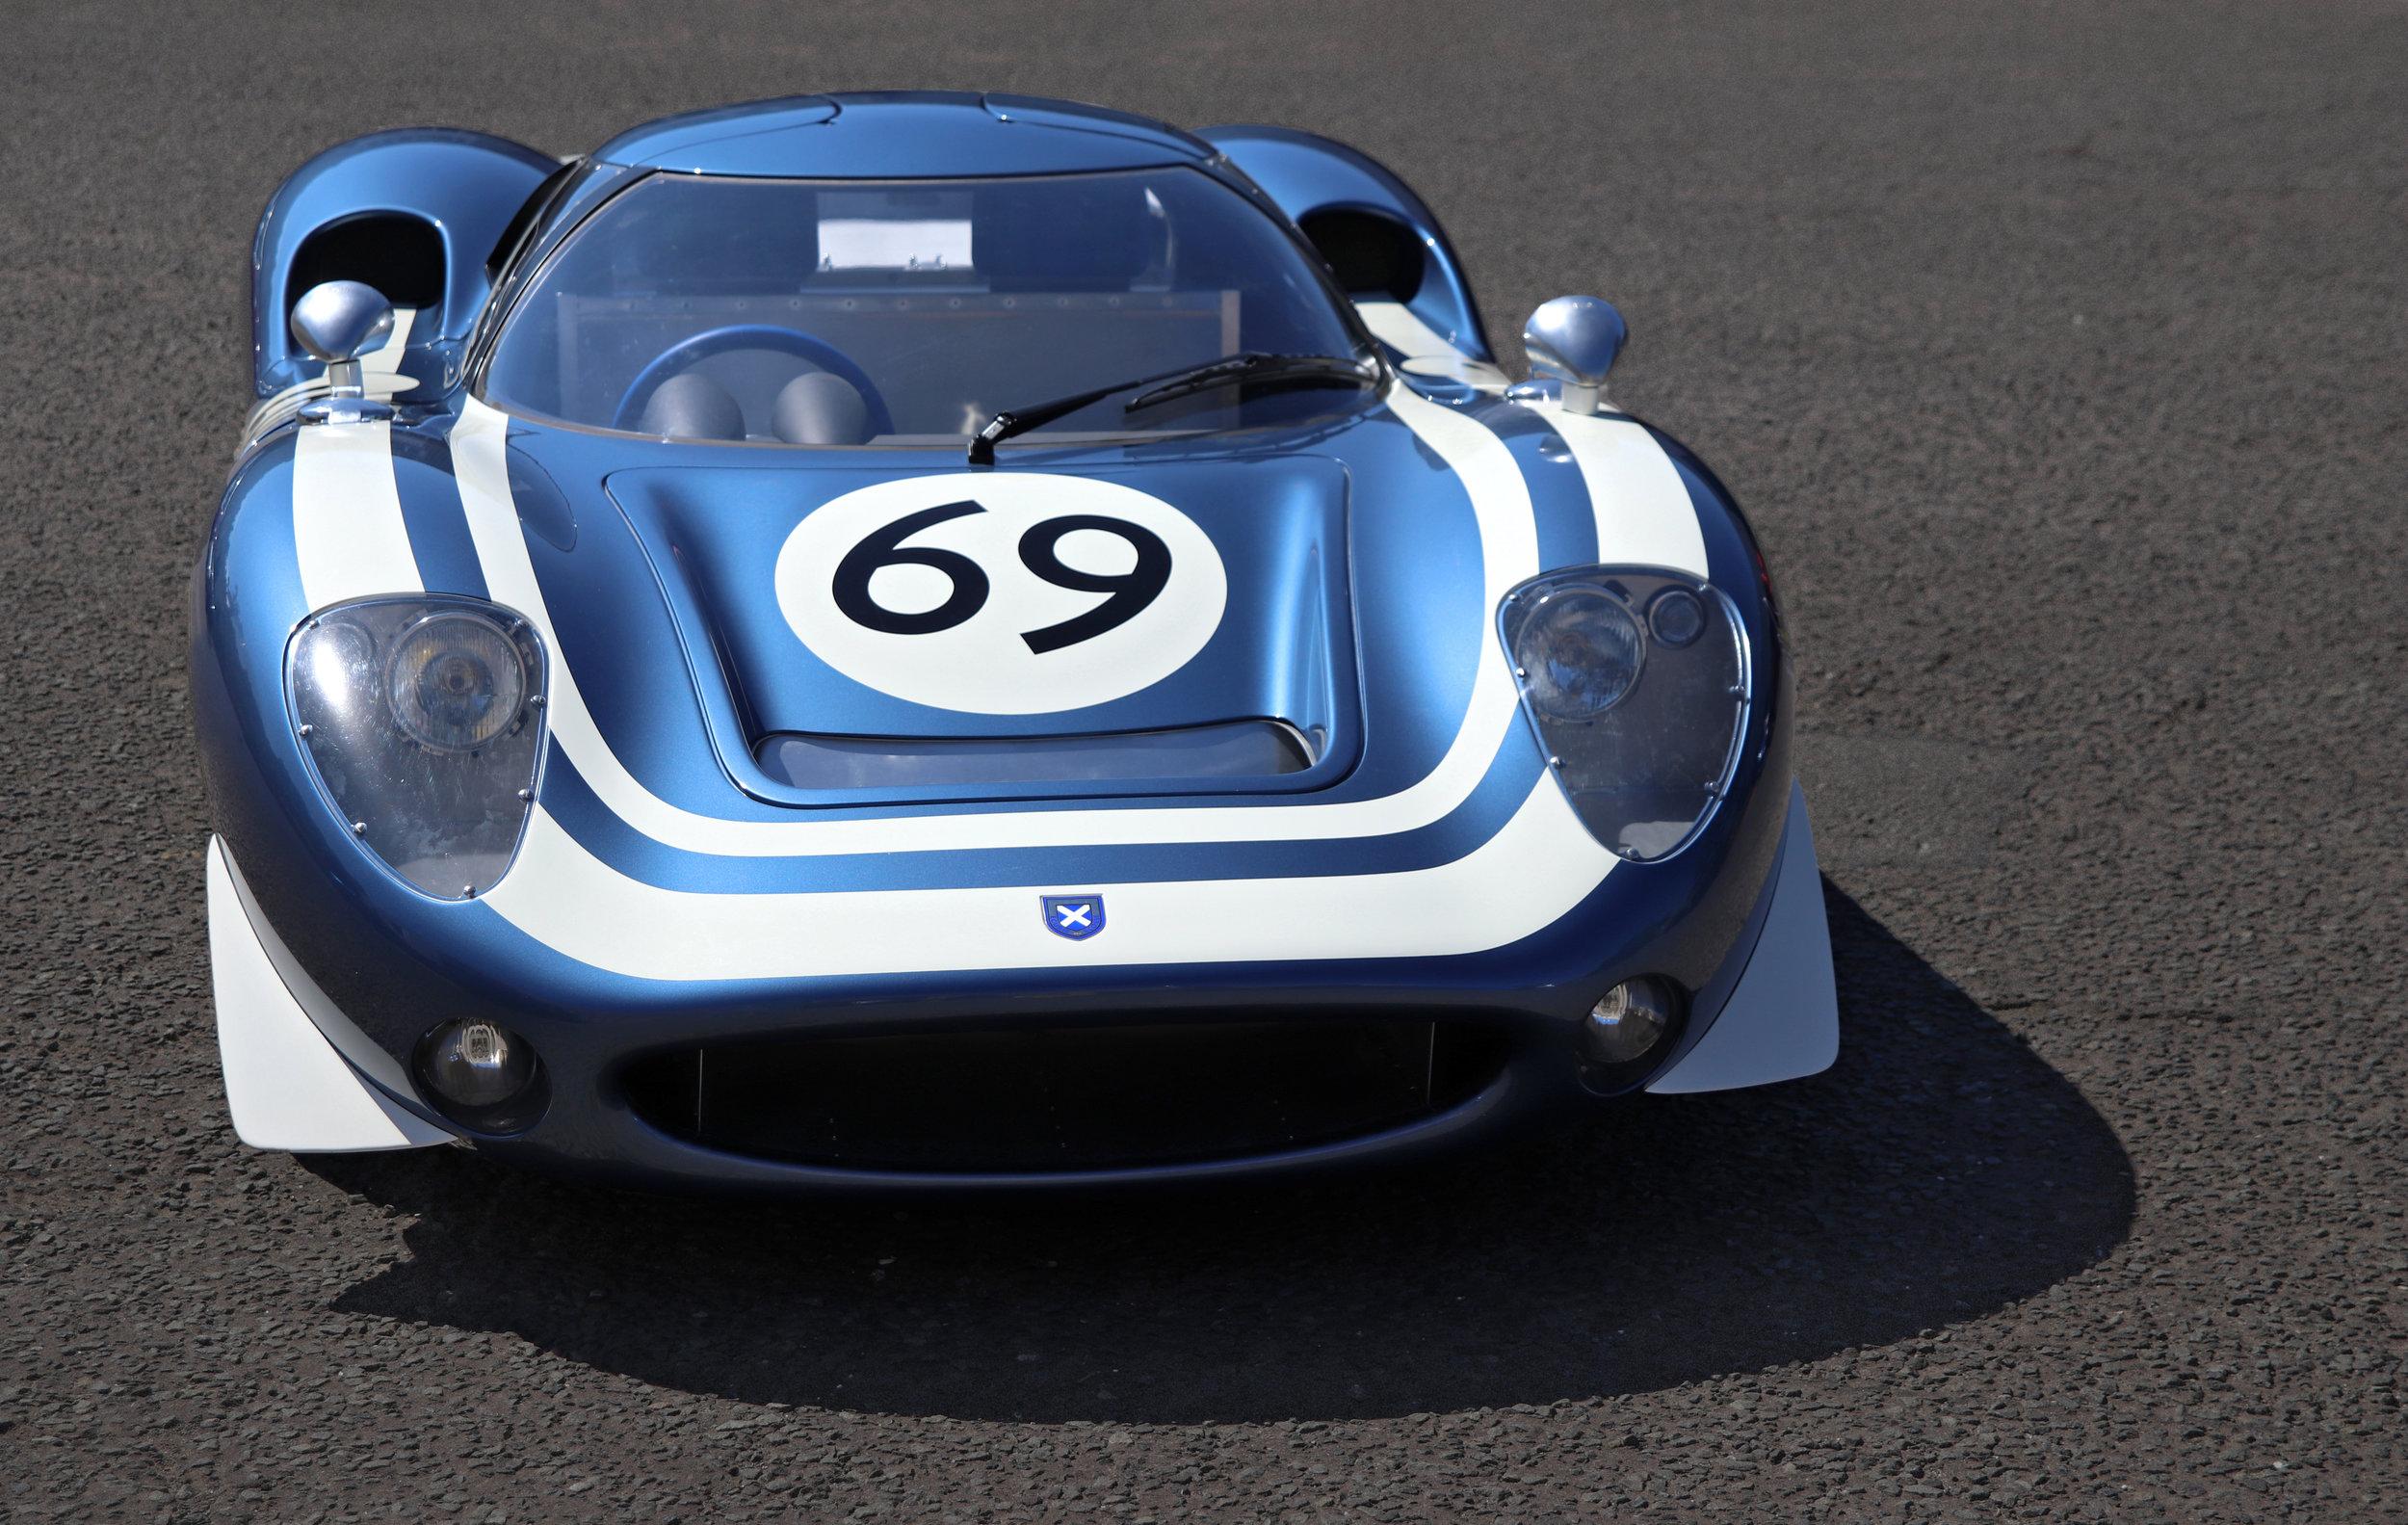 Ecurie Ecosse LM69 front.jpg